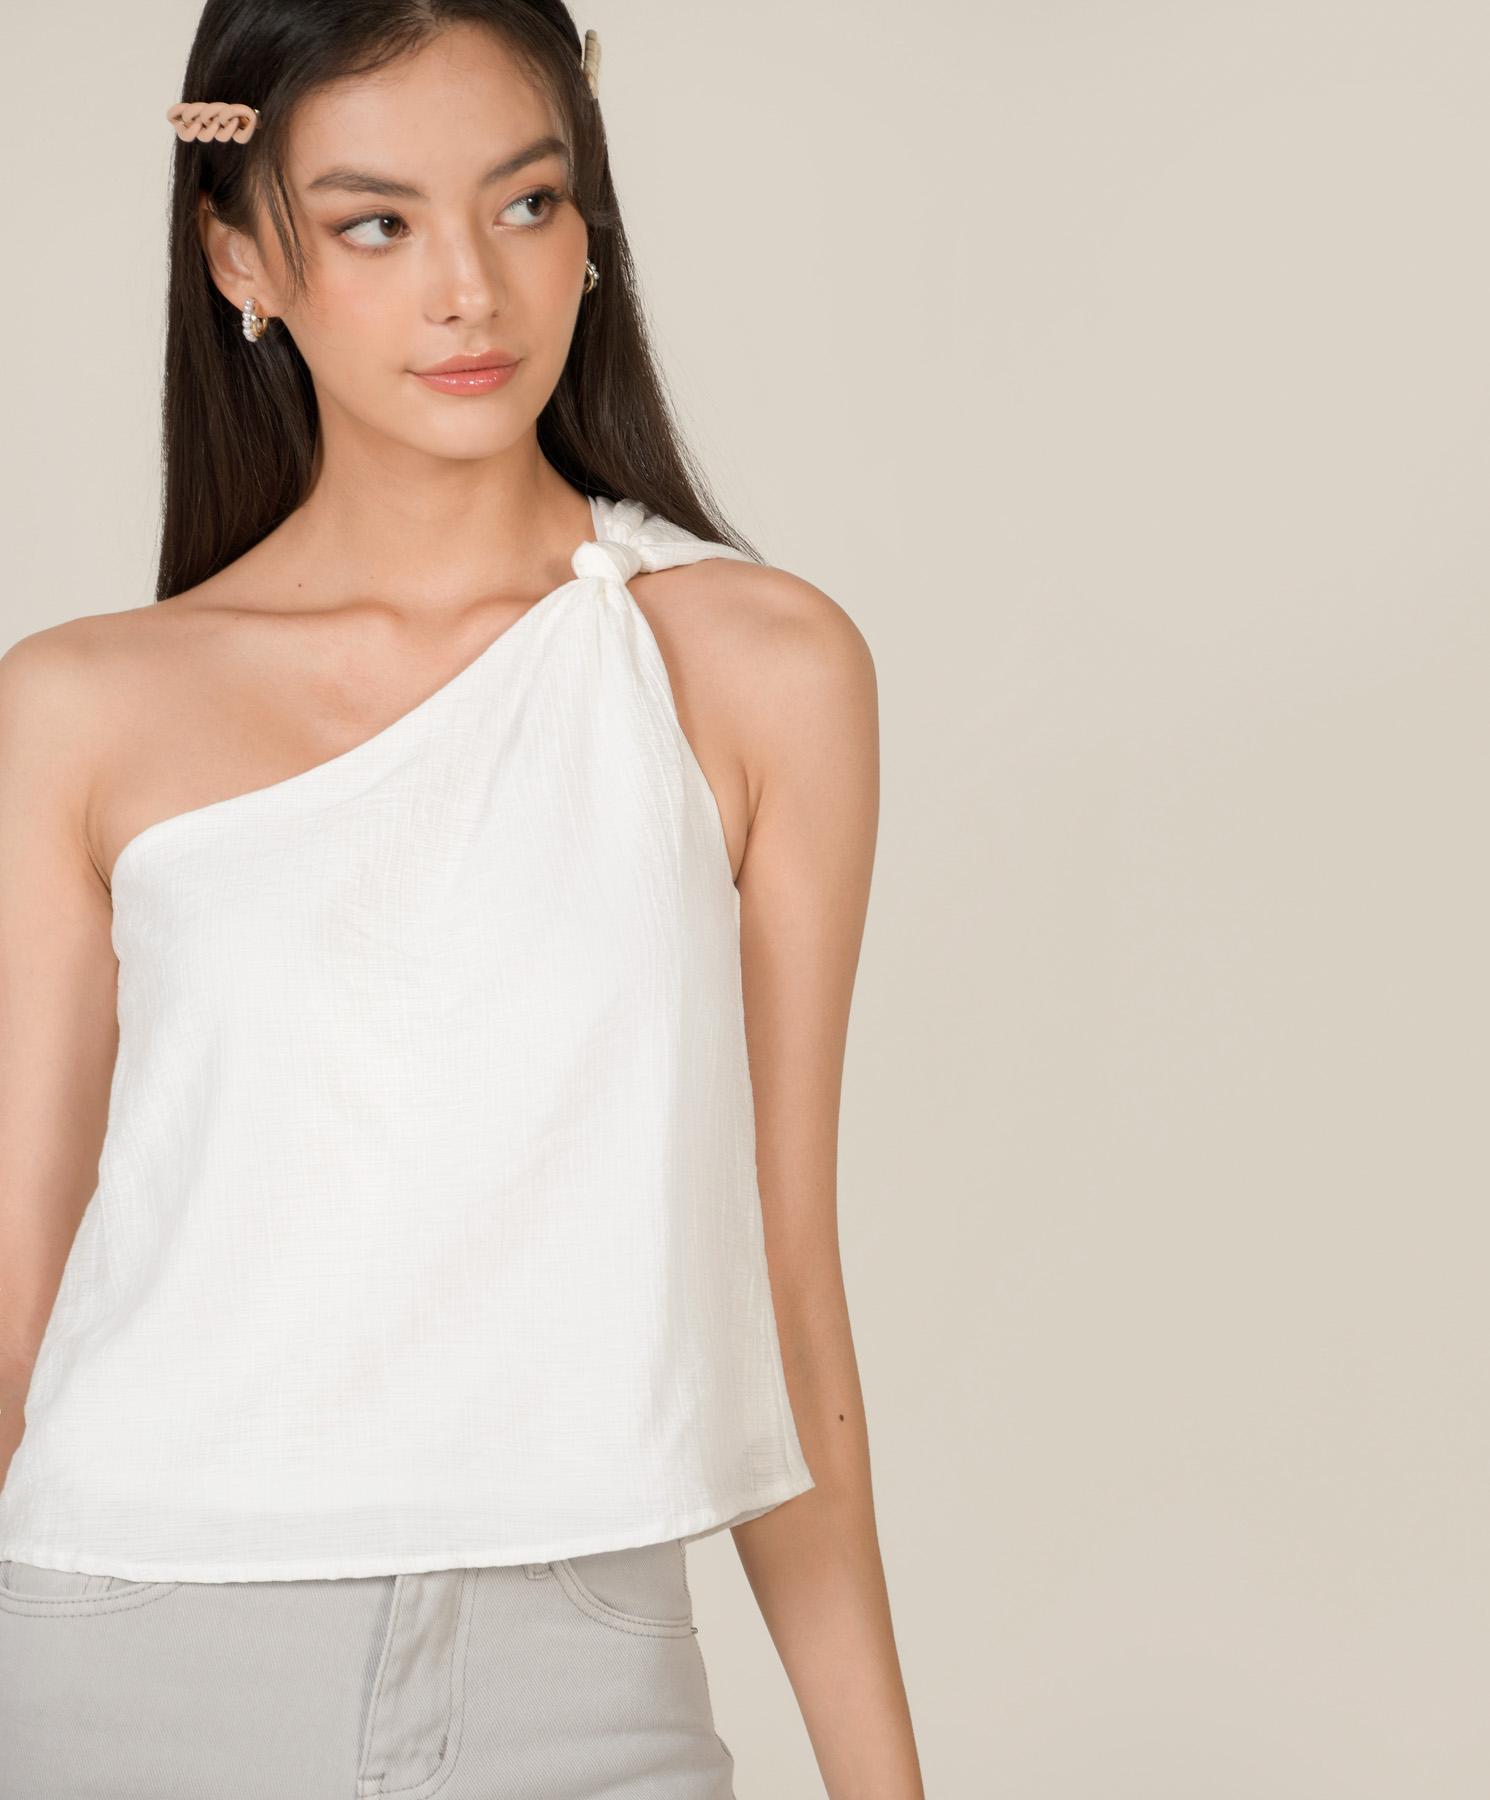 ilona-knot-shoulder-toga-top-white-1